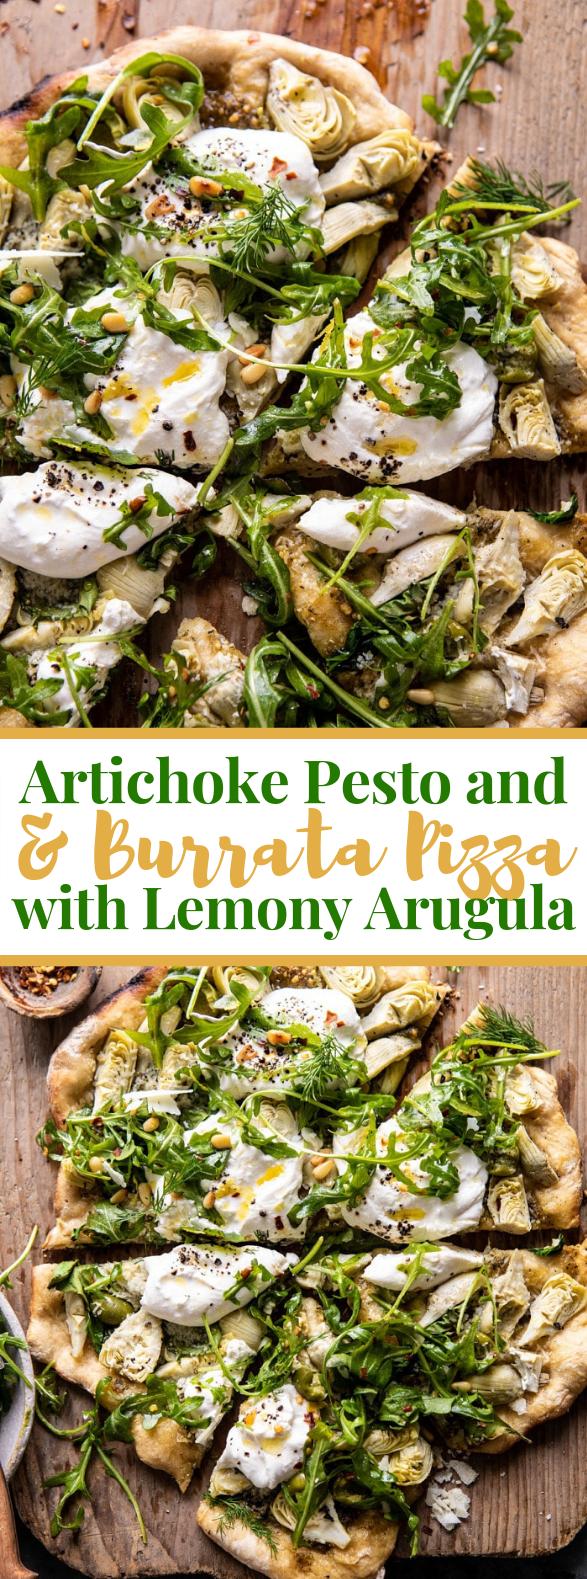 Artichoke Pesto and Burrata Pizza with Lemony Arugula #vegetarian #veggies